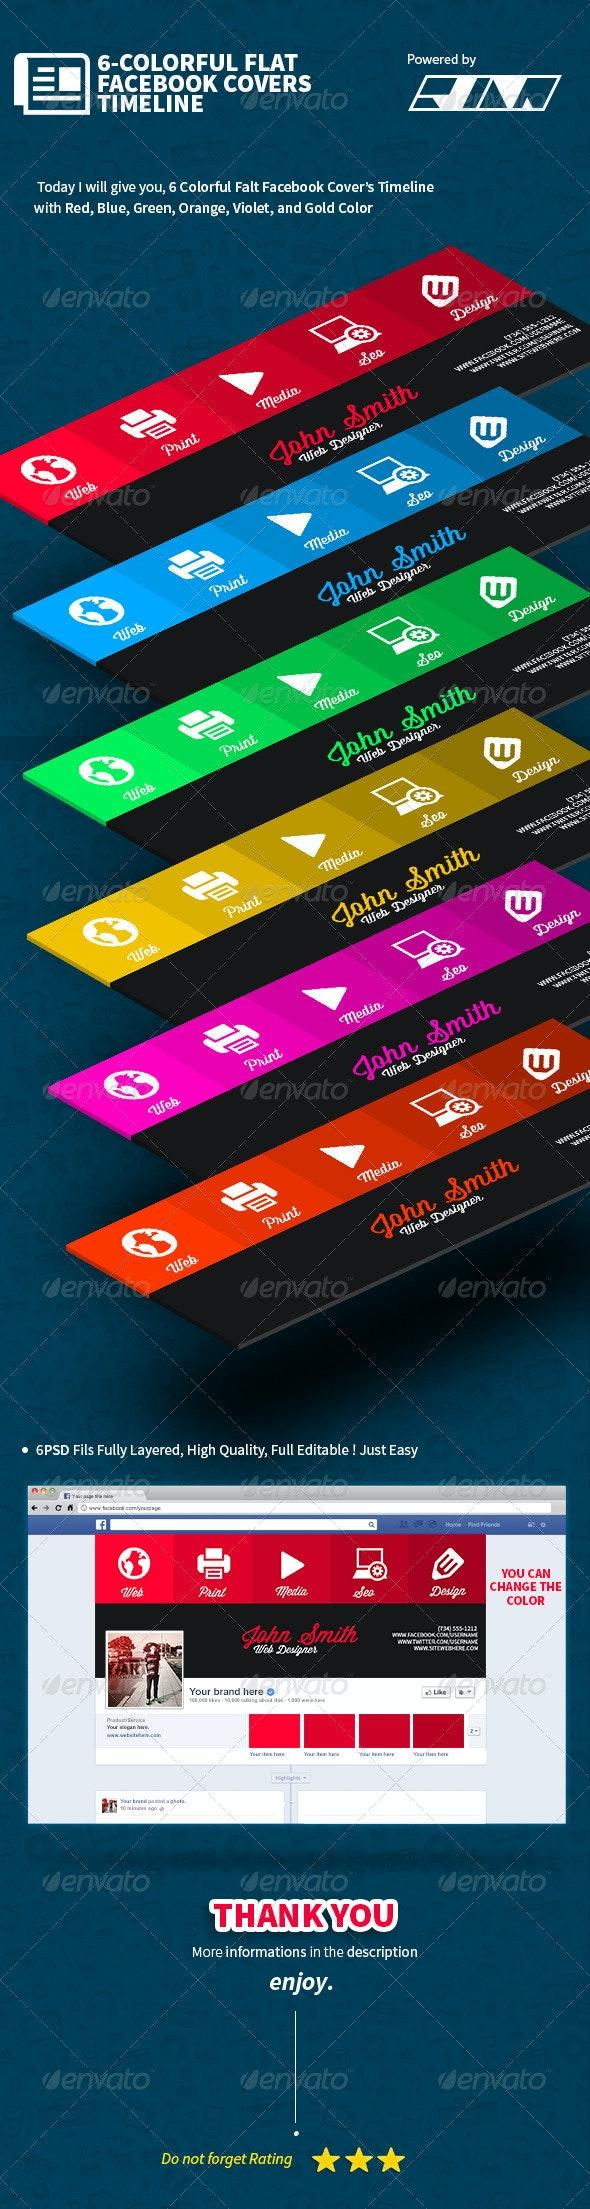 6-Colorful Flat Facebook Timeline Covers - Facebook Timeline Covers Social Media